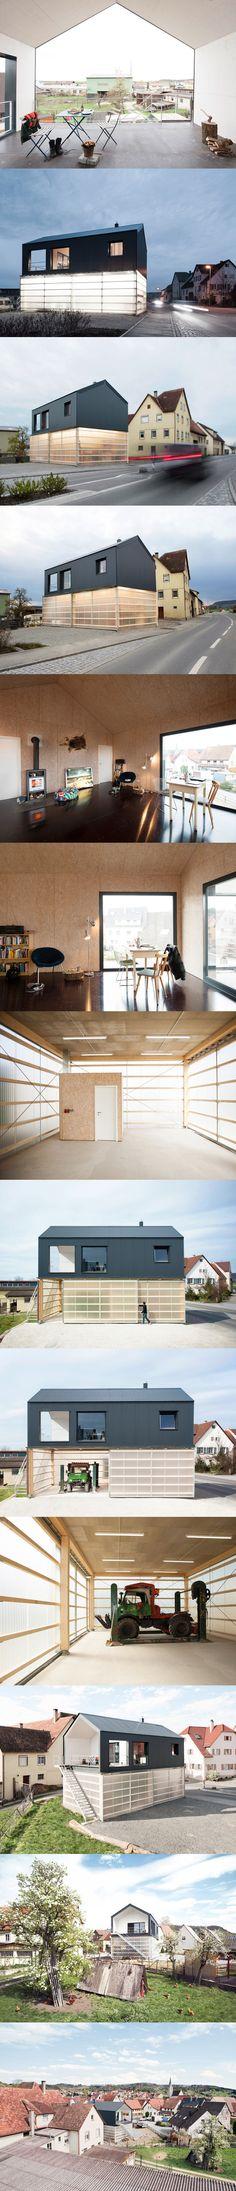 House Unimog stores a truck  within its translucent base  http://www.dezeen.com/2014/01/02/house-unimog-fabian-evers-architecture-wezel-architektur/